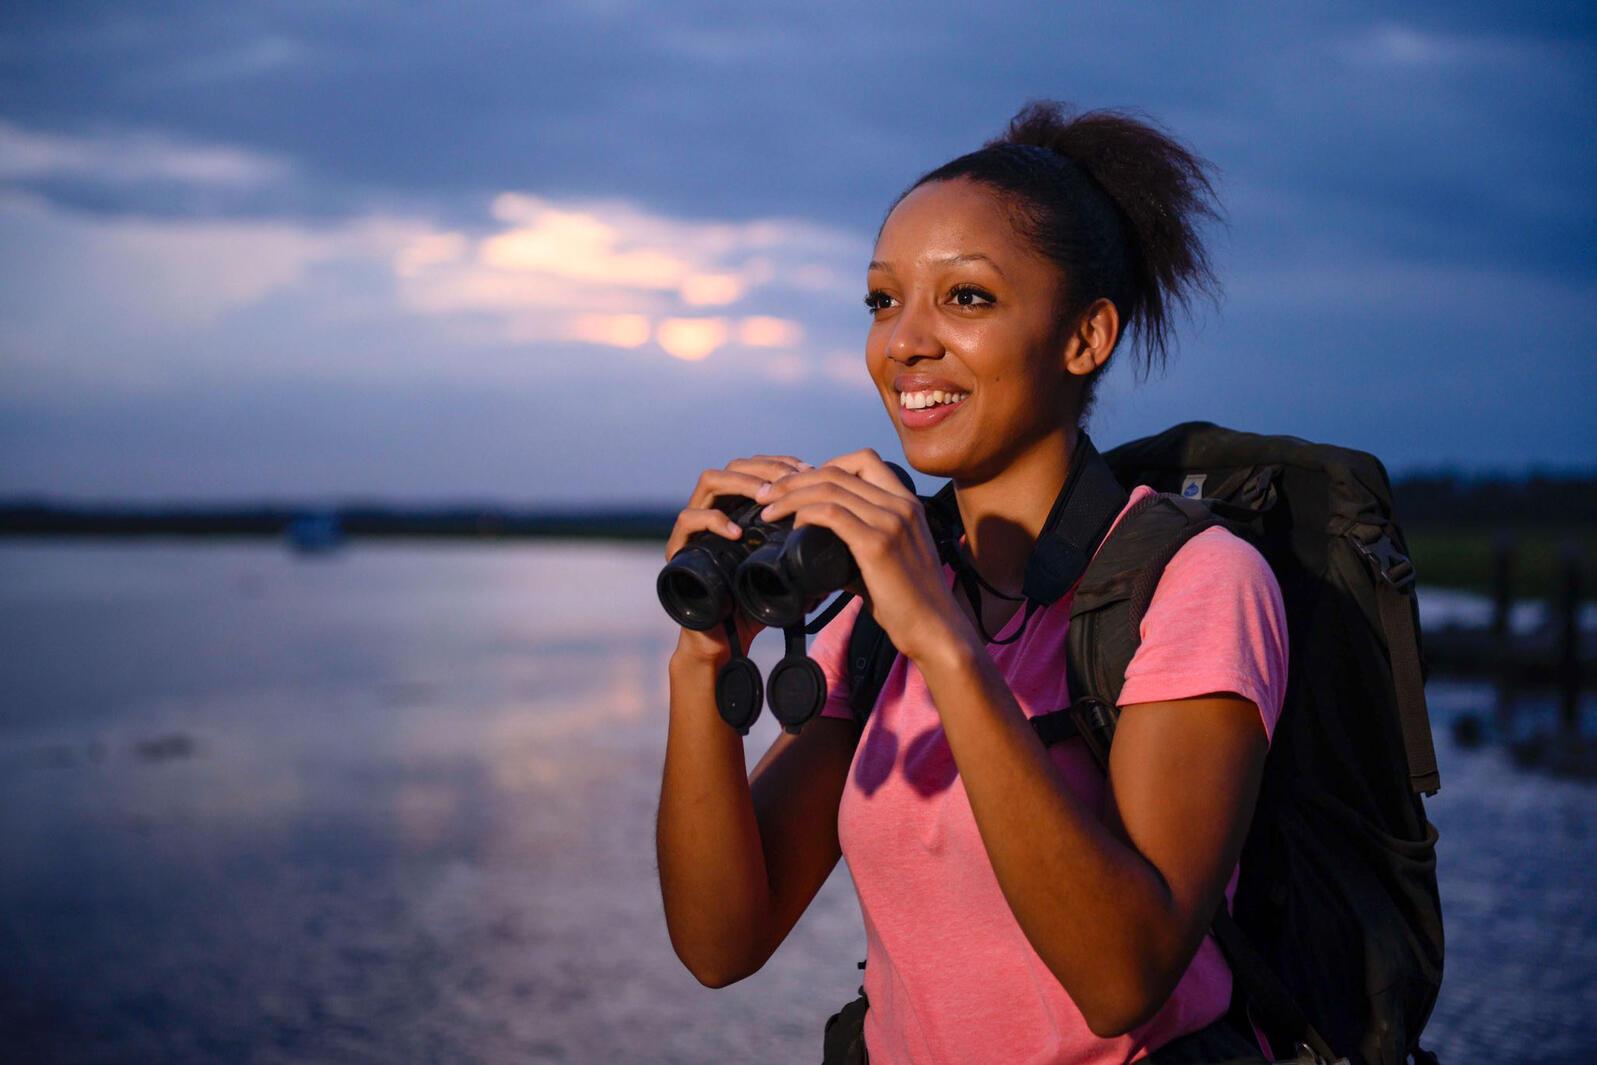 Corina Newsome birding along the Savannah River in Georgia. Katherine Arntzen/Georgia Southern University